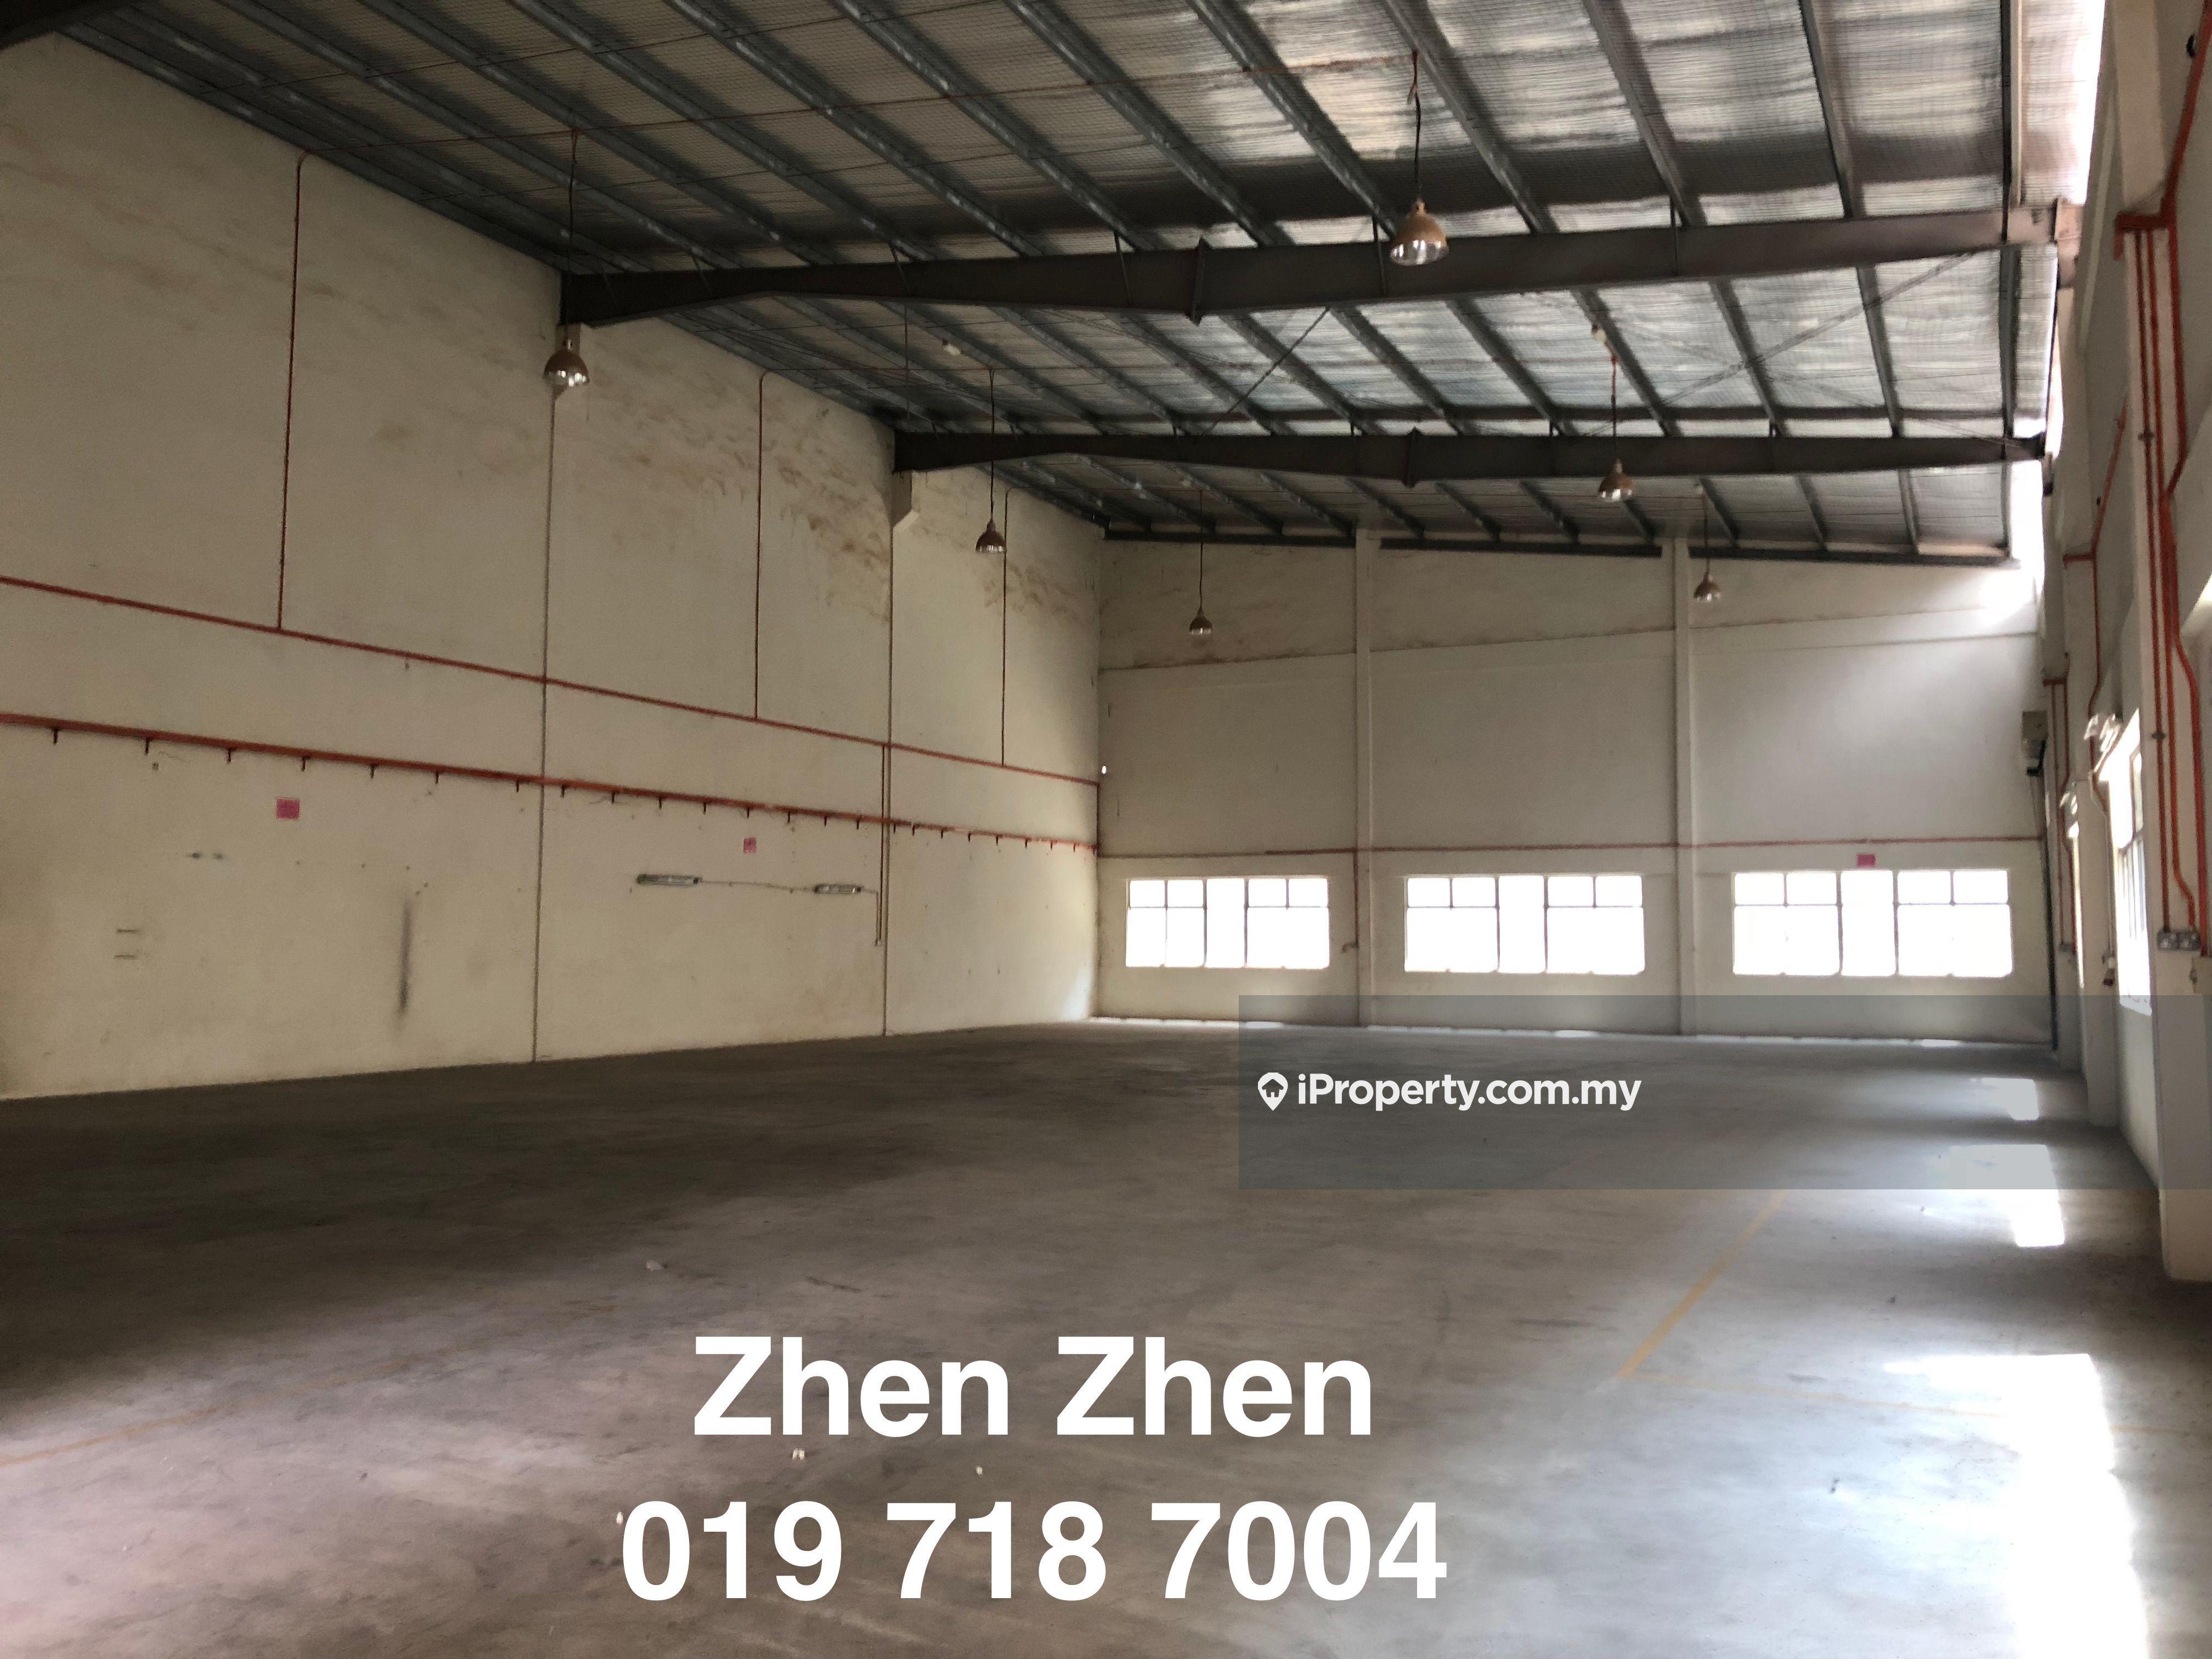 Nusa Cemerlang Industrial Park Factory for Rent Iskandar Gelang Patah Johor Land area 15000 sq ft, Gelang Patah, Iskandar Puteri (Nusajaya)